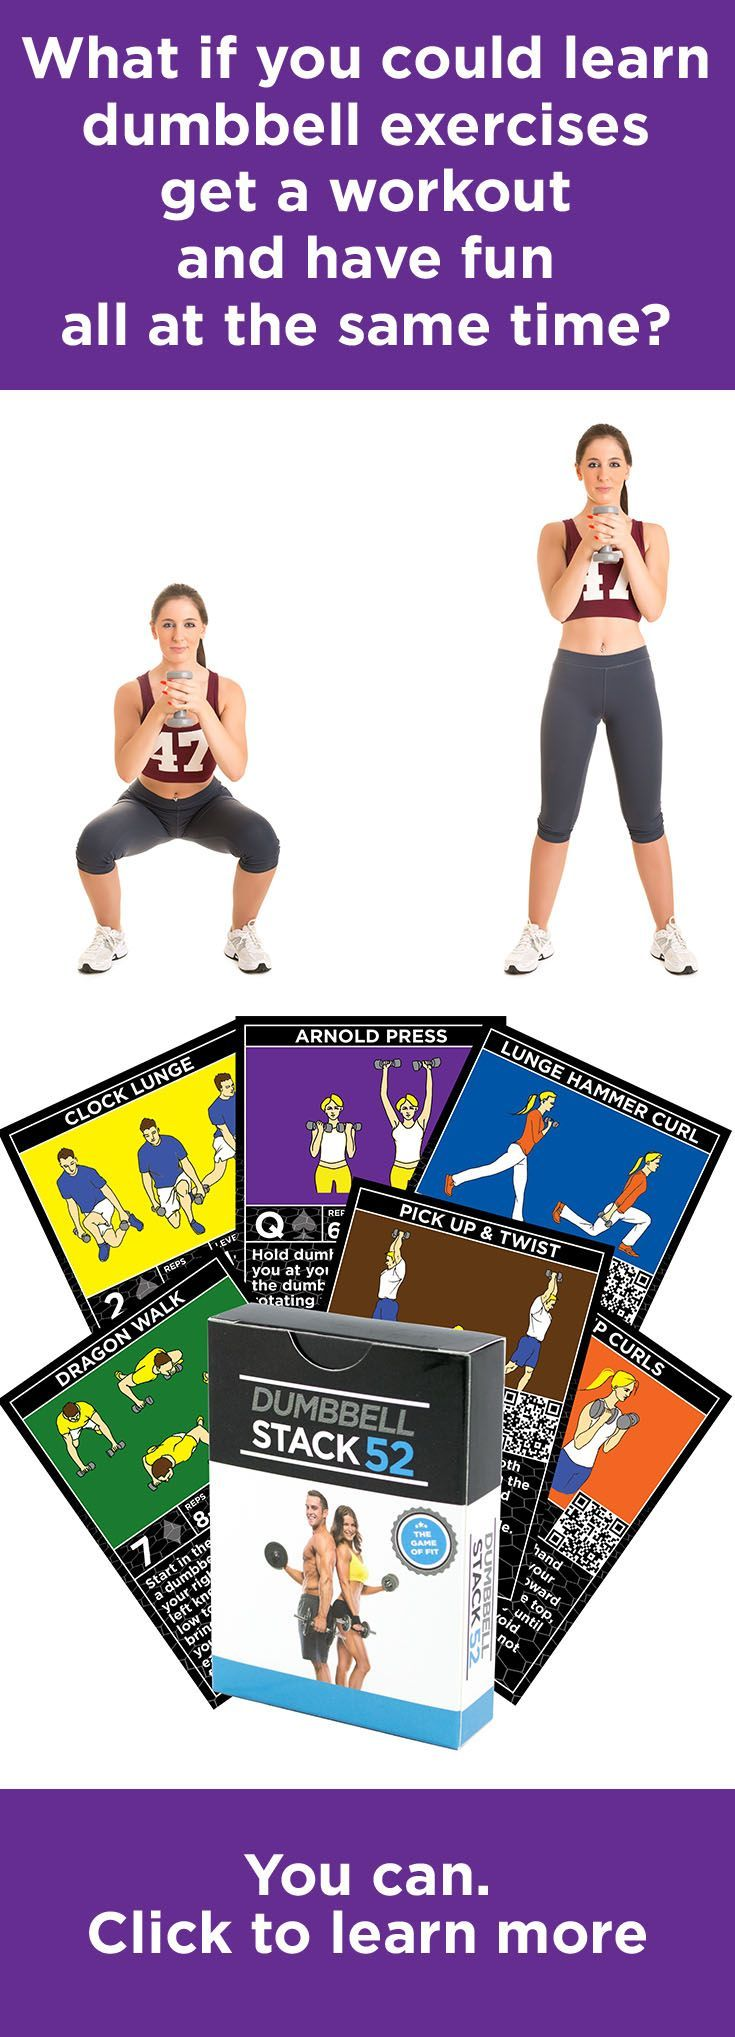 Dumbbell Exercise Cards #dumbbellexercises Visit stack52.com/dumbbell to learn more functional movement dumbbell exercises #dumbbellexercises